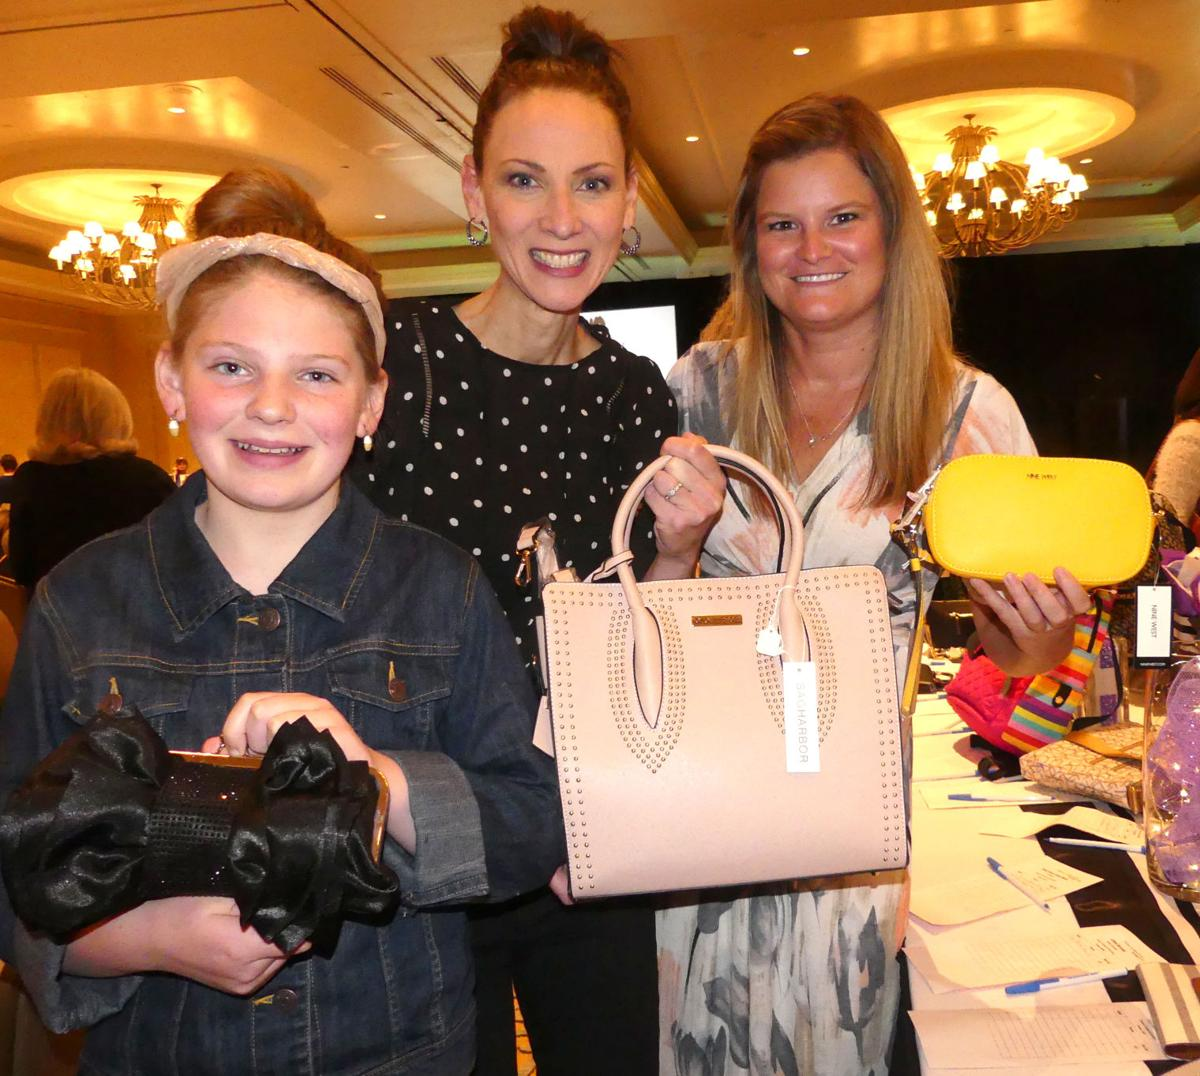 Coach, Fossil, Kate Spade among fashionable names at handbag auction